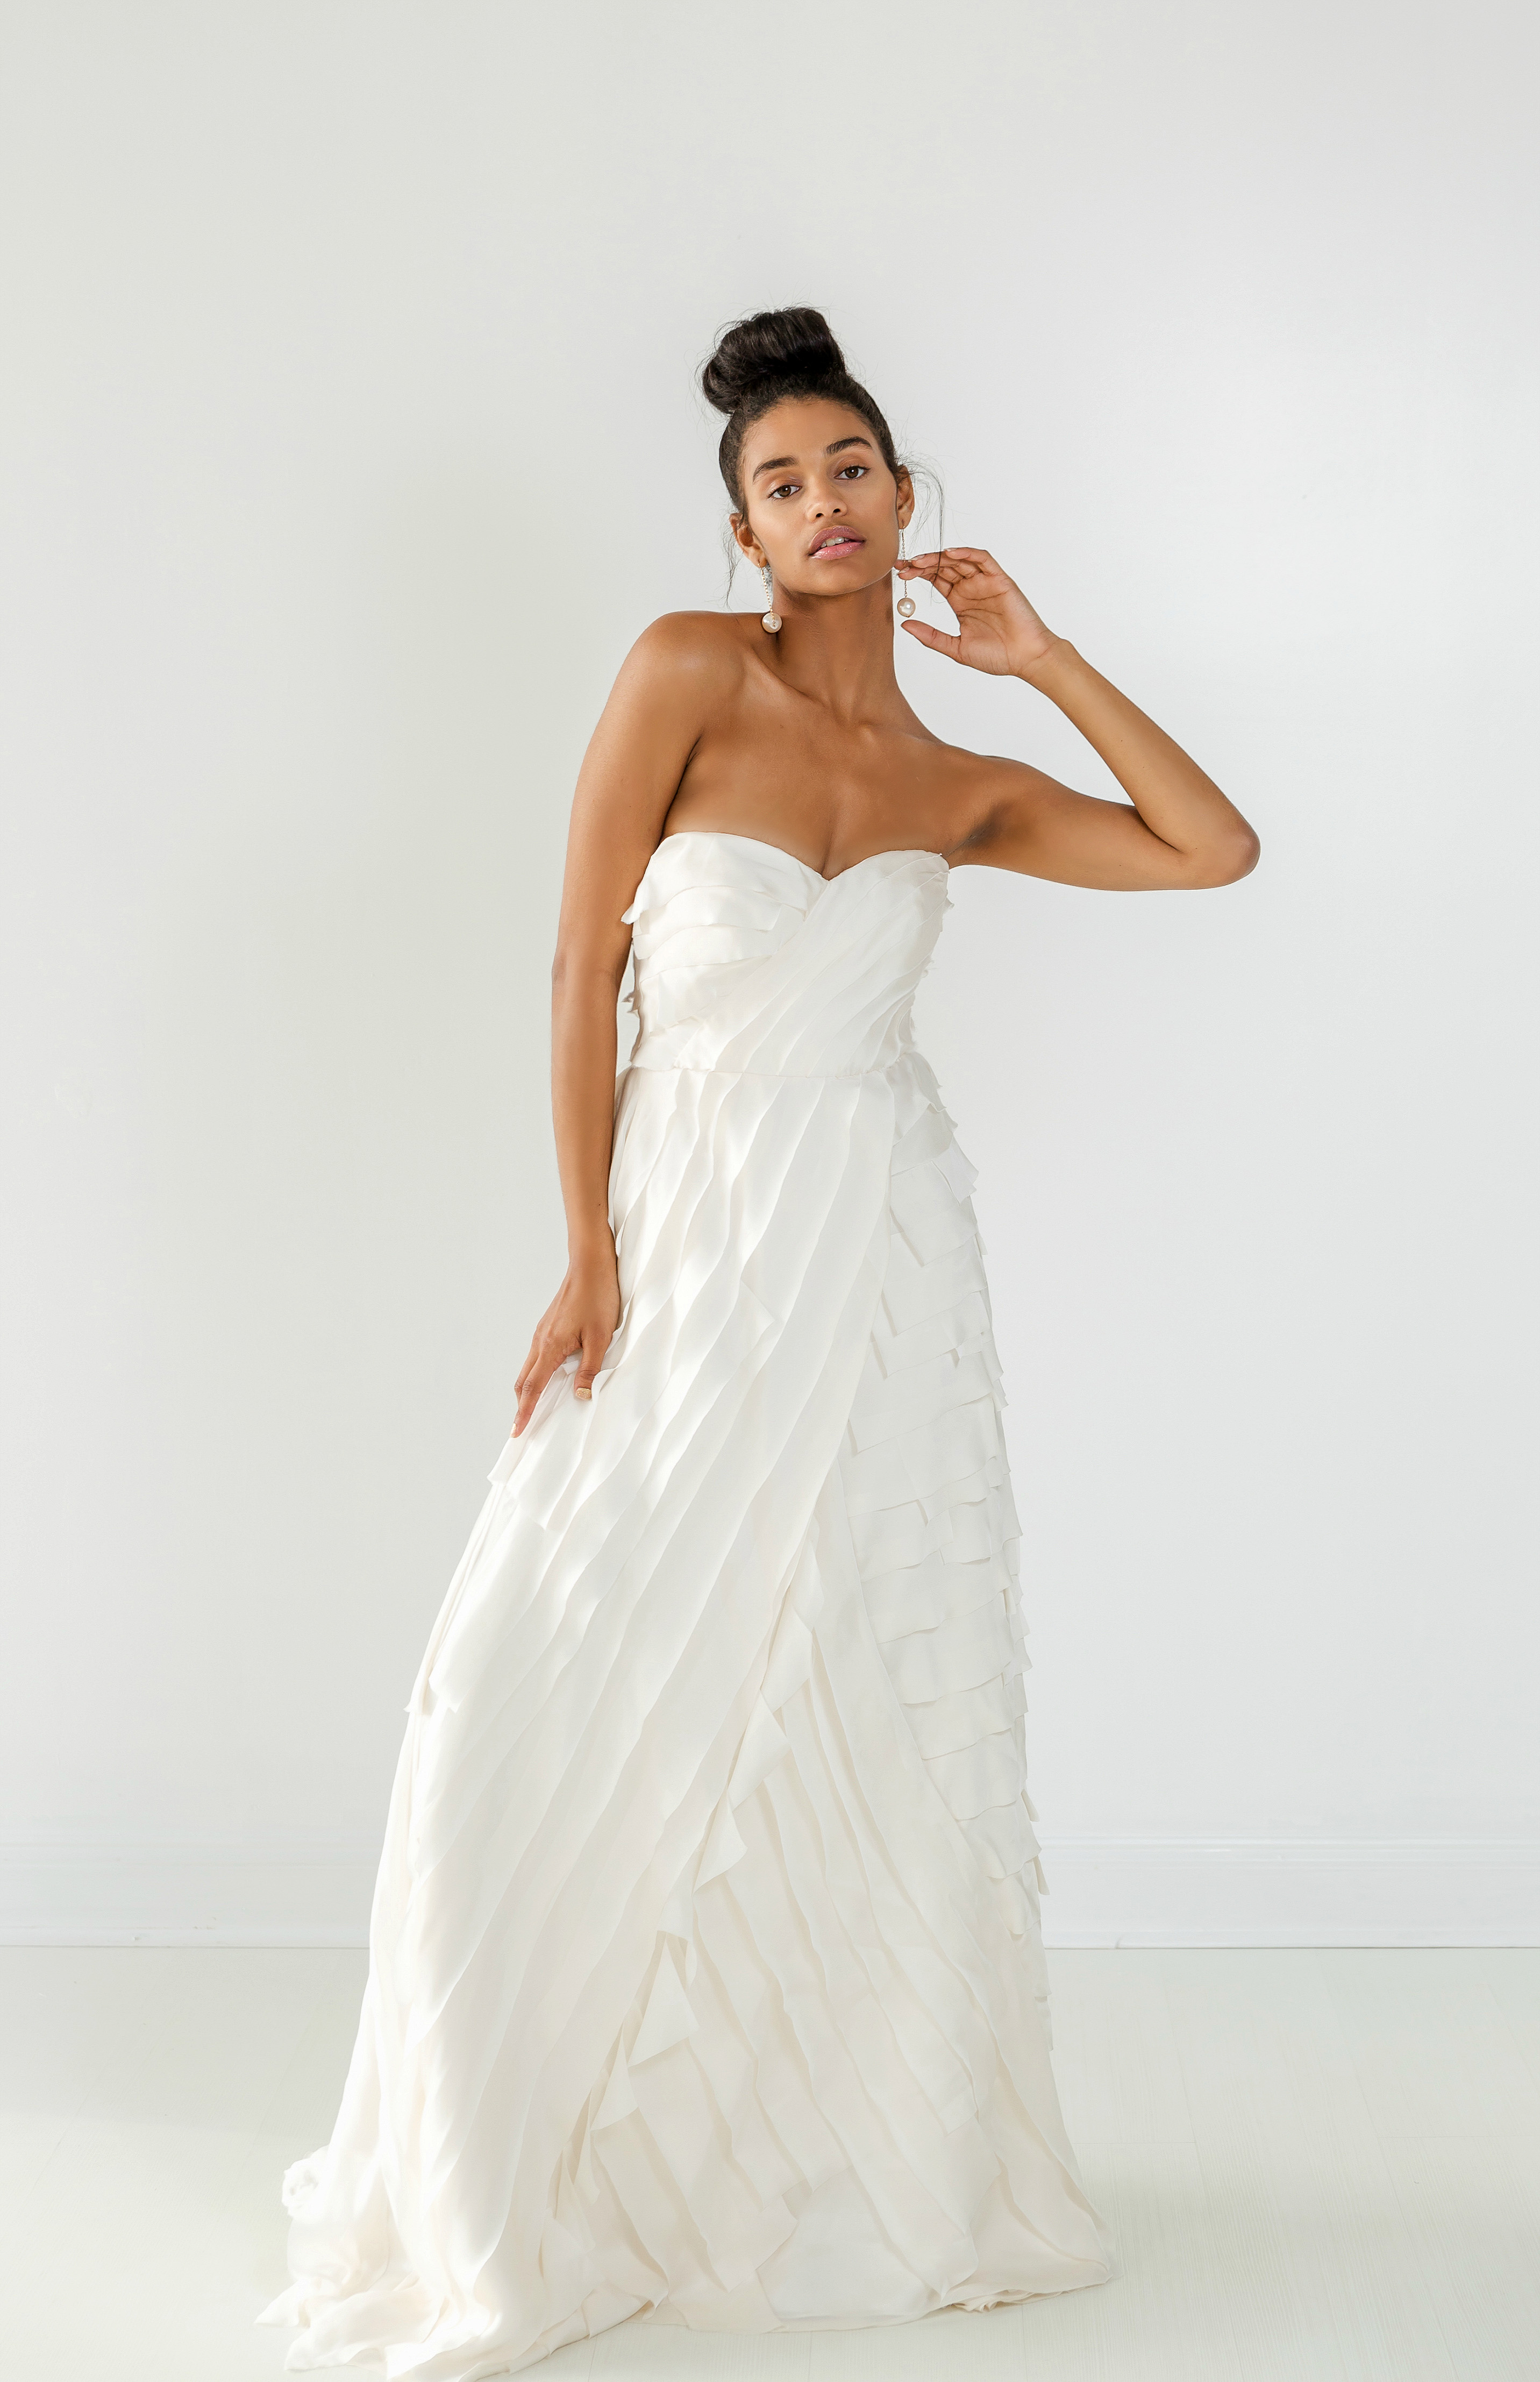 ivy aster dress fall 2018 sweetheart a-line ruffles